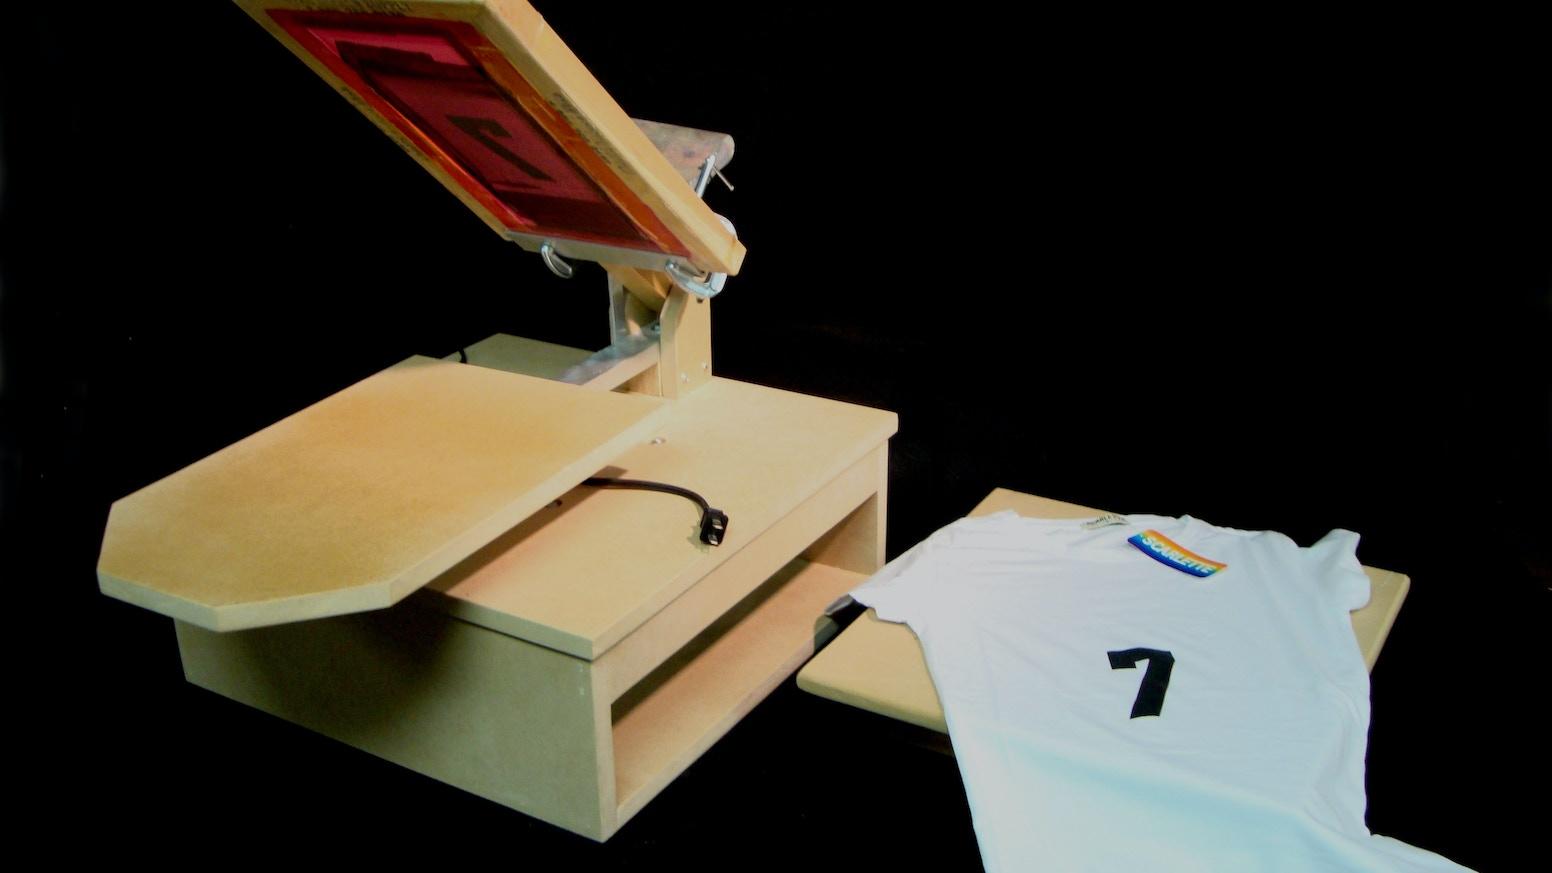 Diy t shirt screen printing press for Diy t shirt screen printing at home